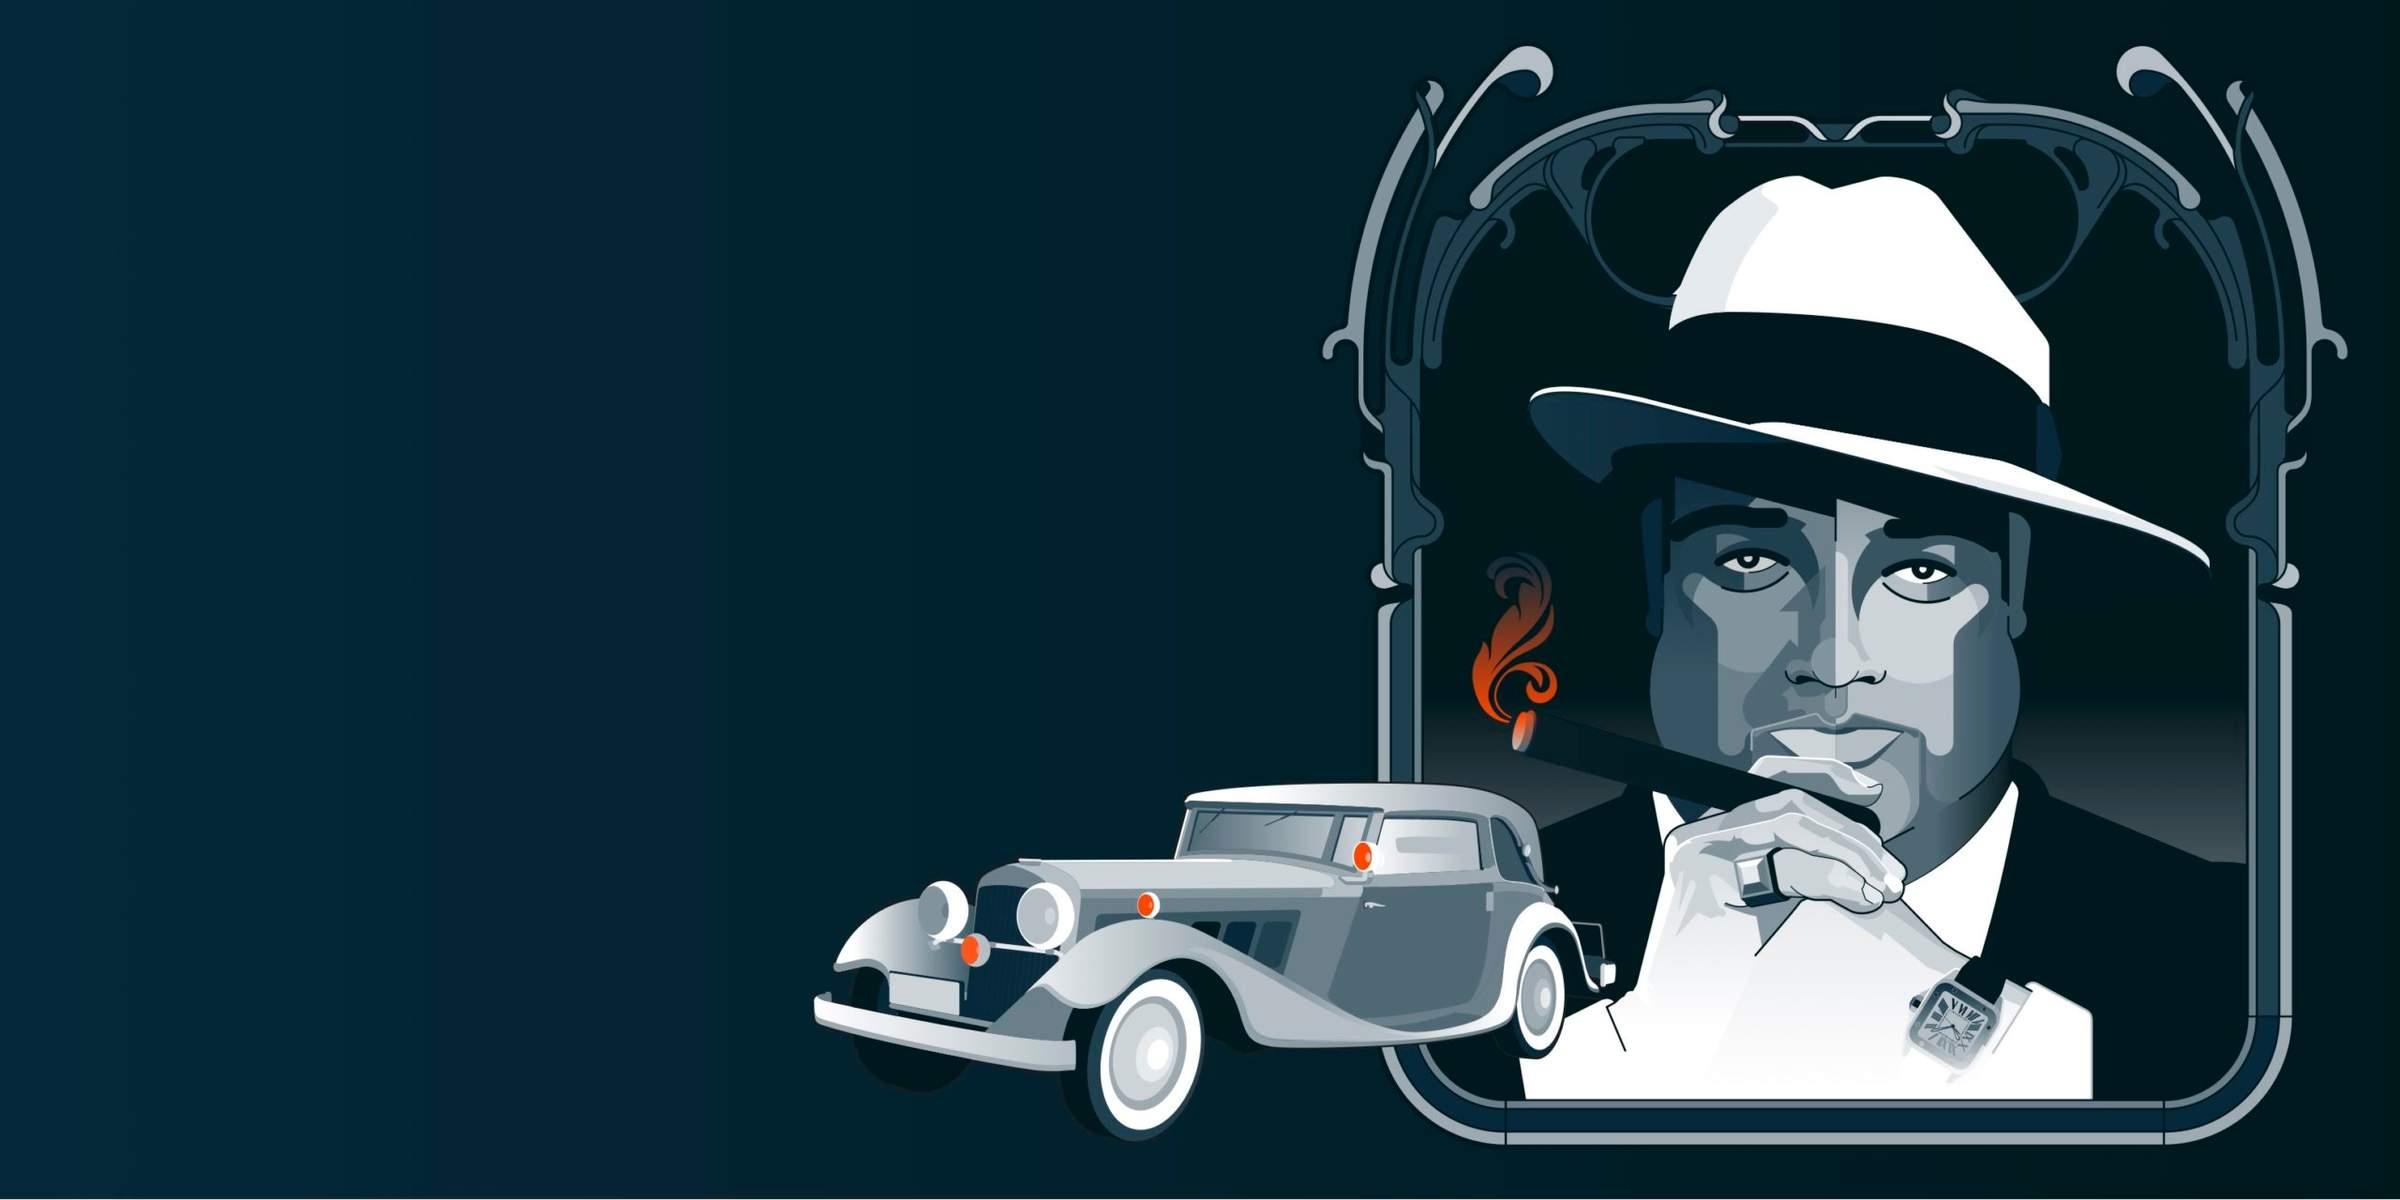 12_PTR_Al Capone_2-1